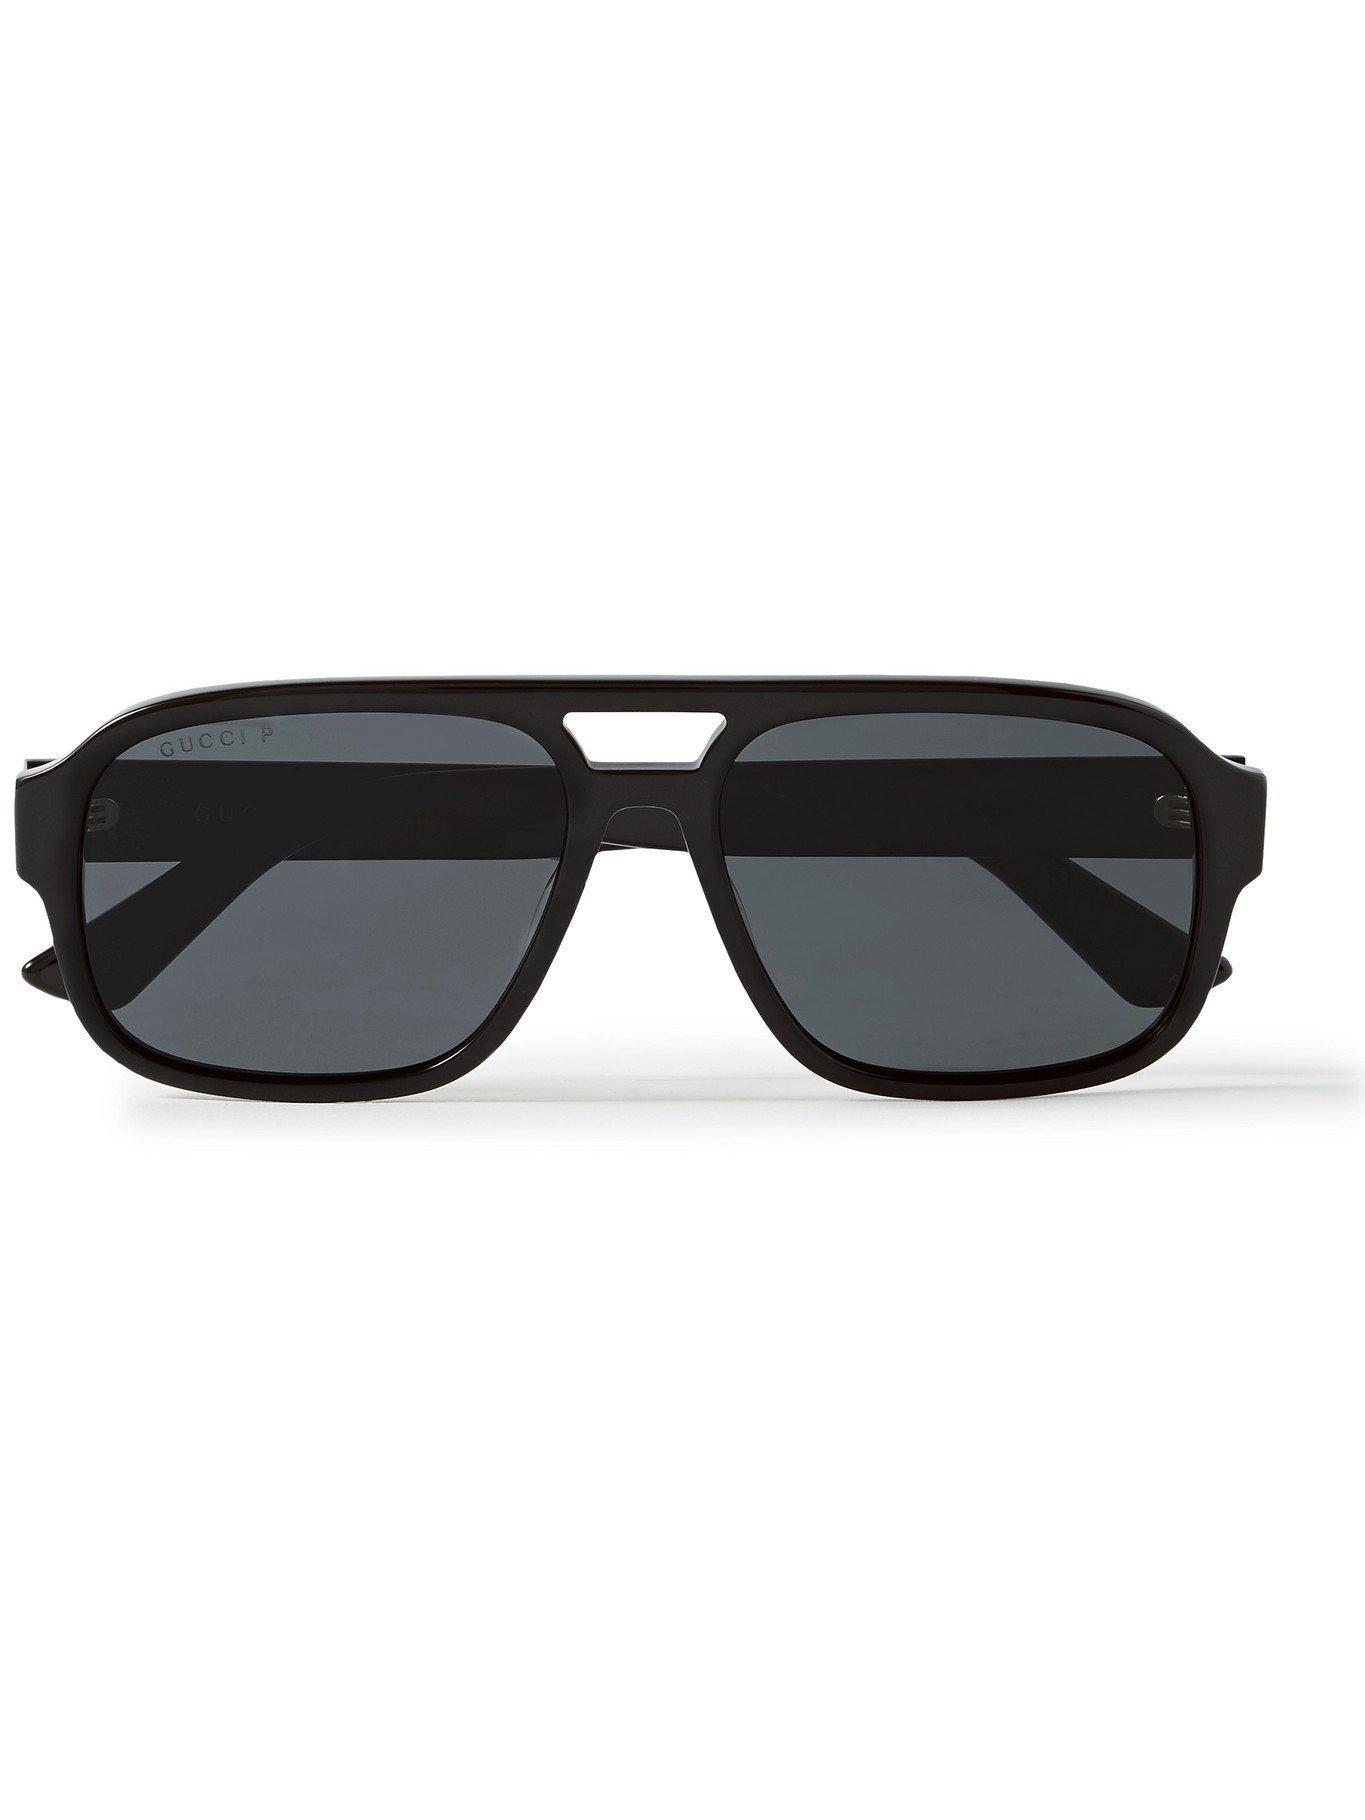 Photo: GUCCI - Aviator-Style Acetate Sunglasses - Black